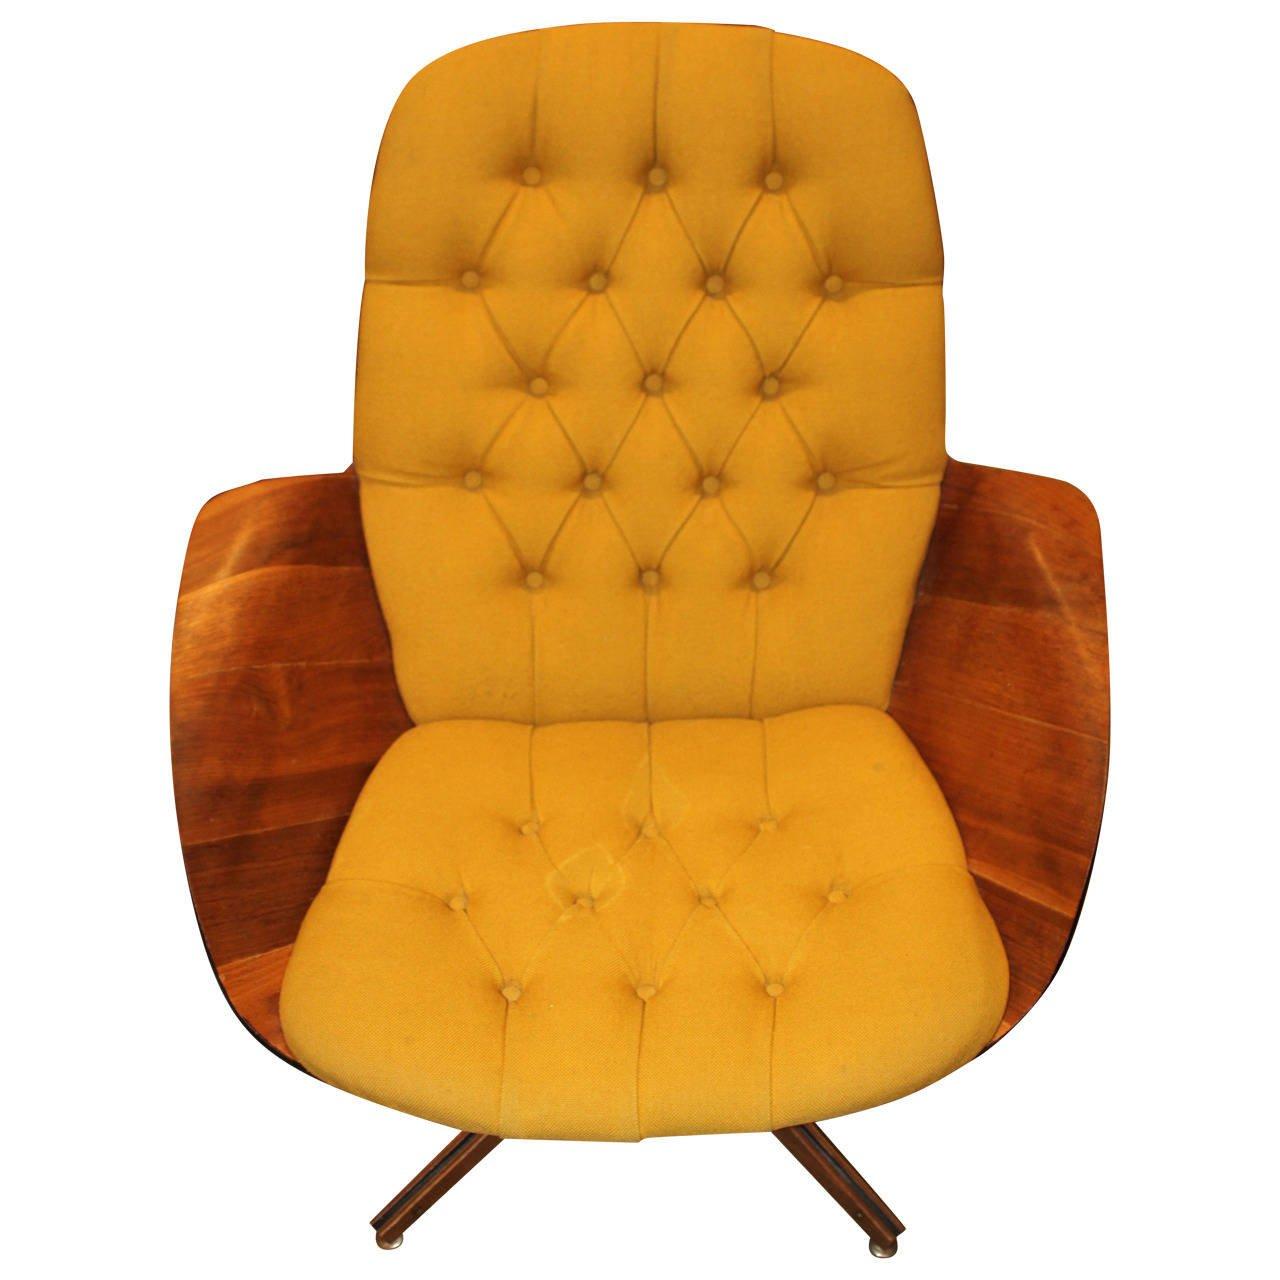 Fine Swivel Lounge Chair By George Mulhauser For Plycraft Designer Austin Tx Realtor Ibusinesslaw Wood Chair Design Ideas Ibusinesslaworg